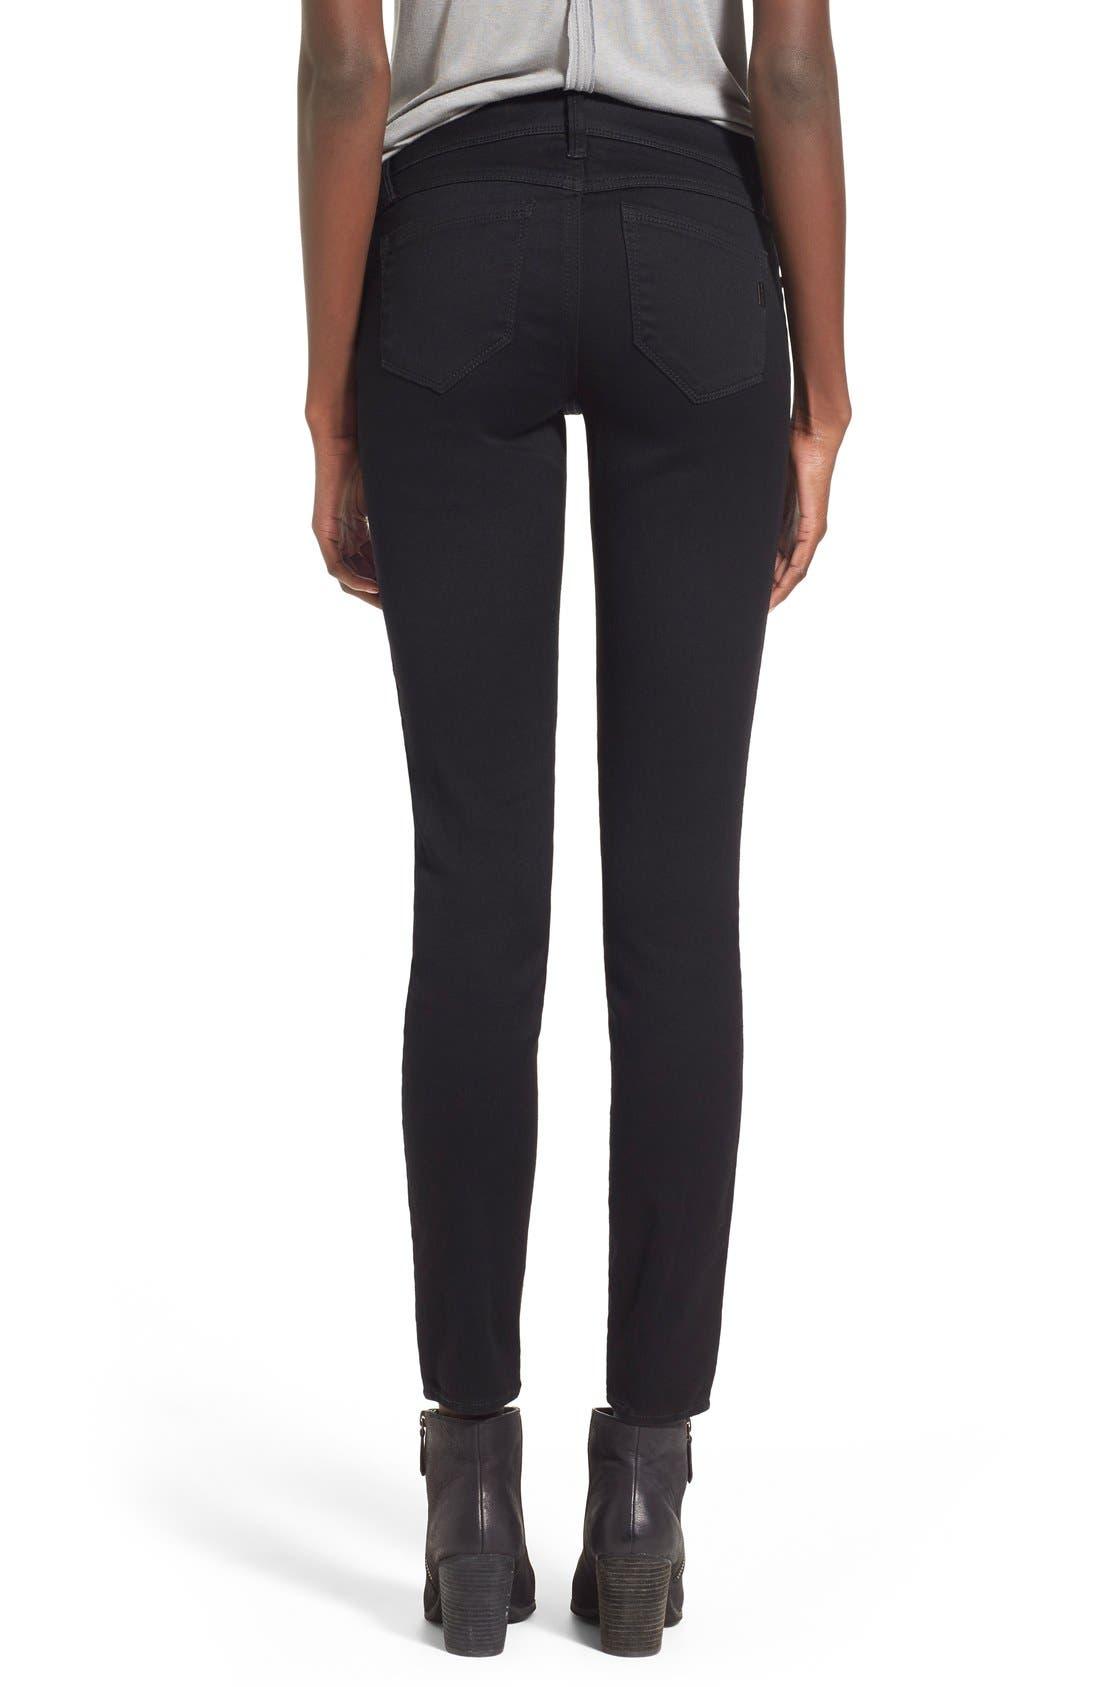 Butter Skinny Jeans,                             Alternate thumbnail 5, color,                             BLACK